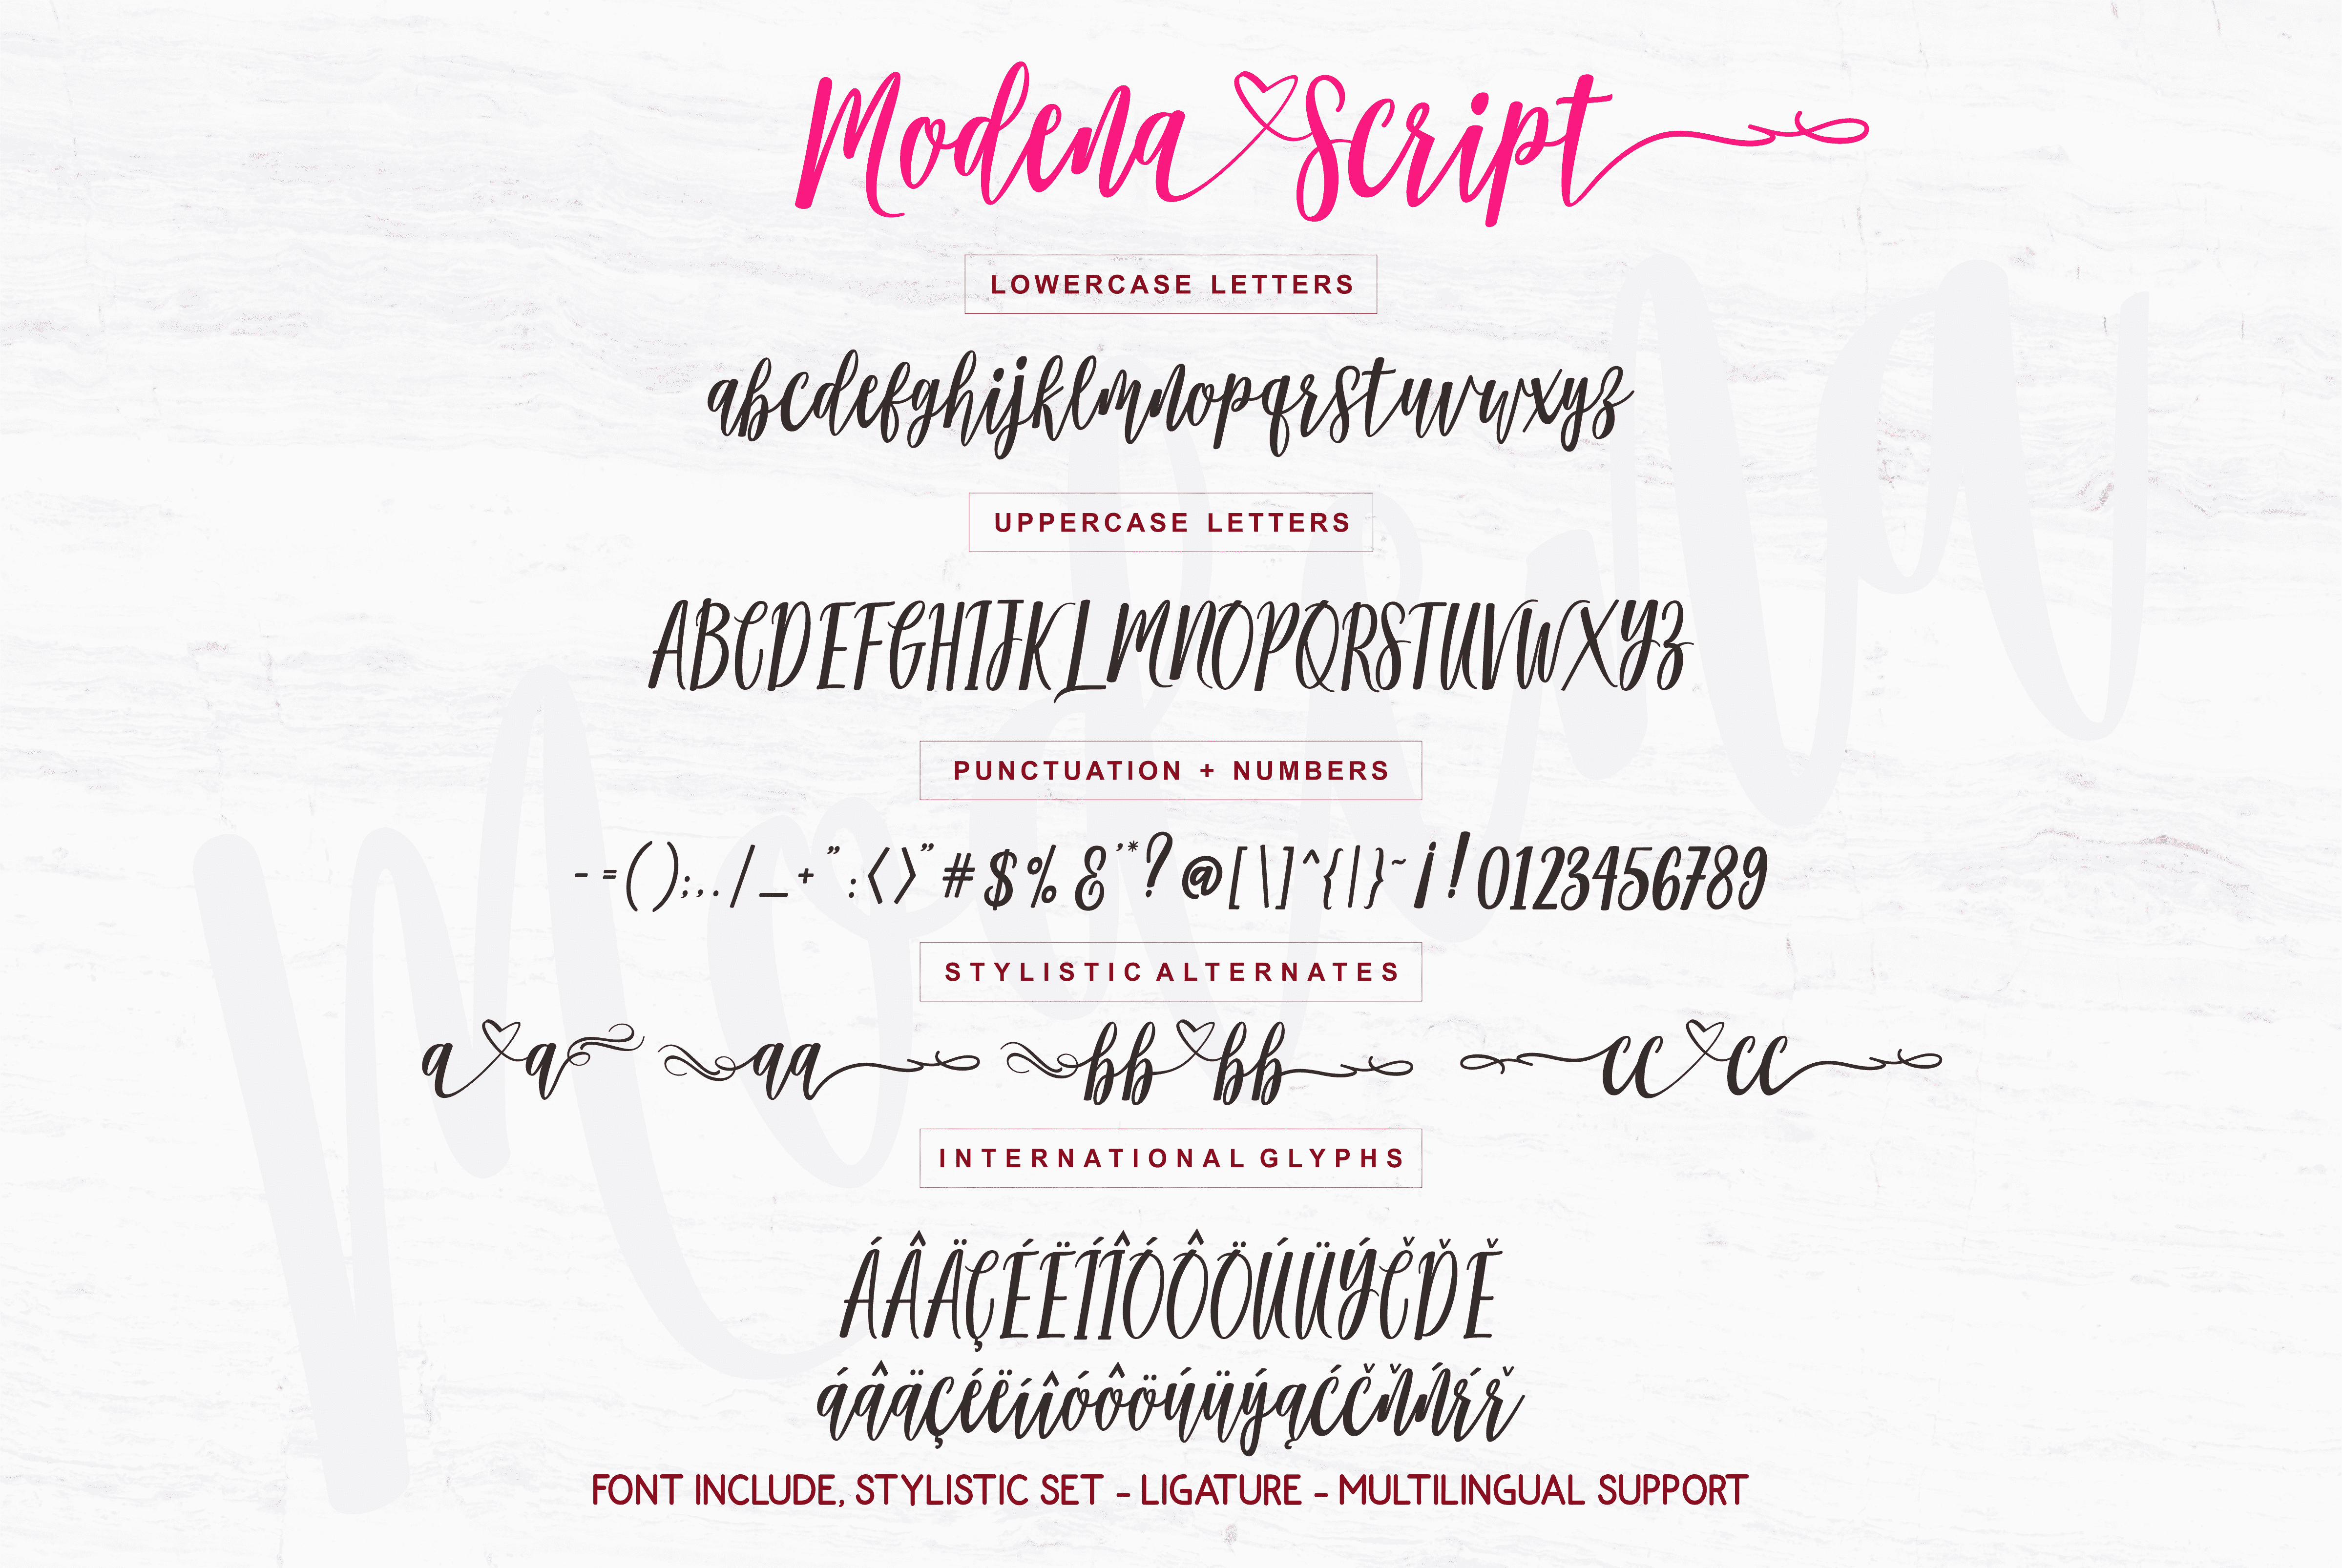 Modena Handwriting Font